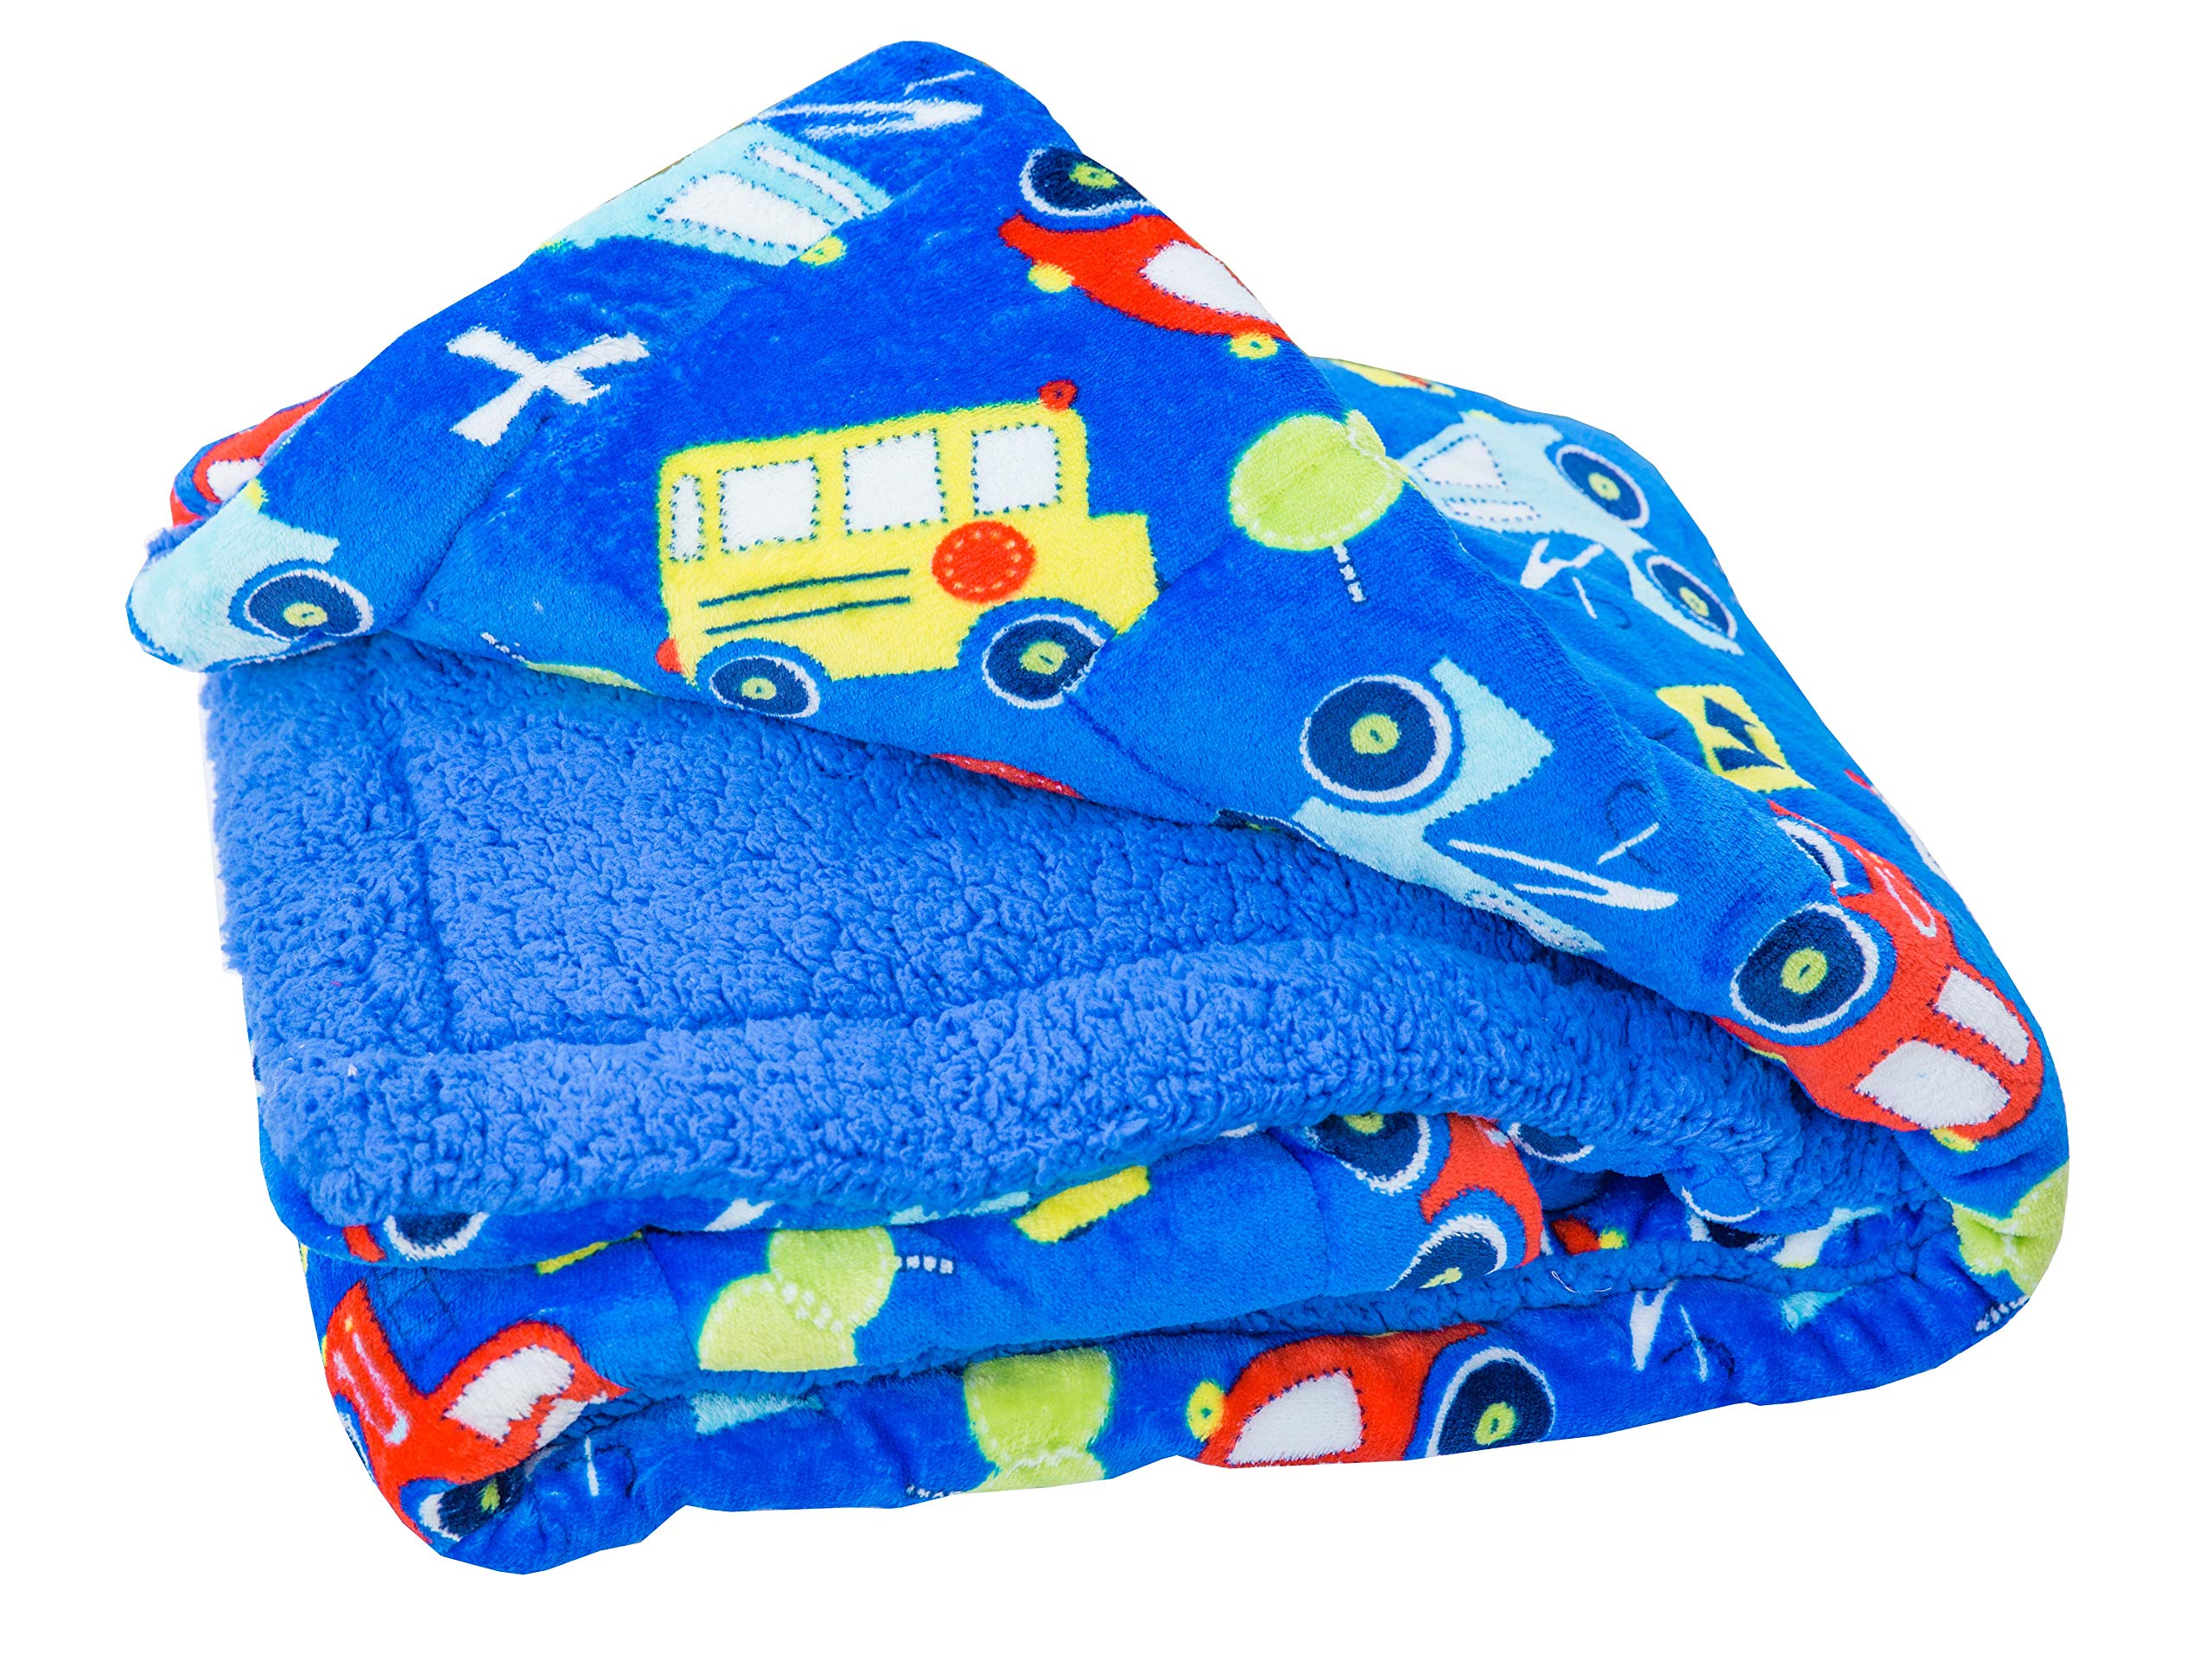 Elegant Home Kids Soft & Warm Cars Trucks Buses Sherpa Baby Toddler Boy Sherpa Blanket Multicolor Printed Borrego Stroller or Toddler Bed Blanket Plush Throw 40X50# Car by Elegant Home